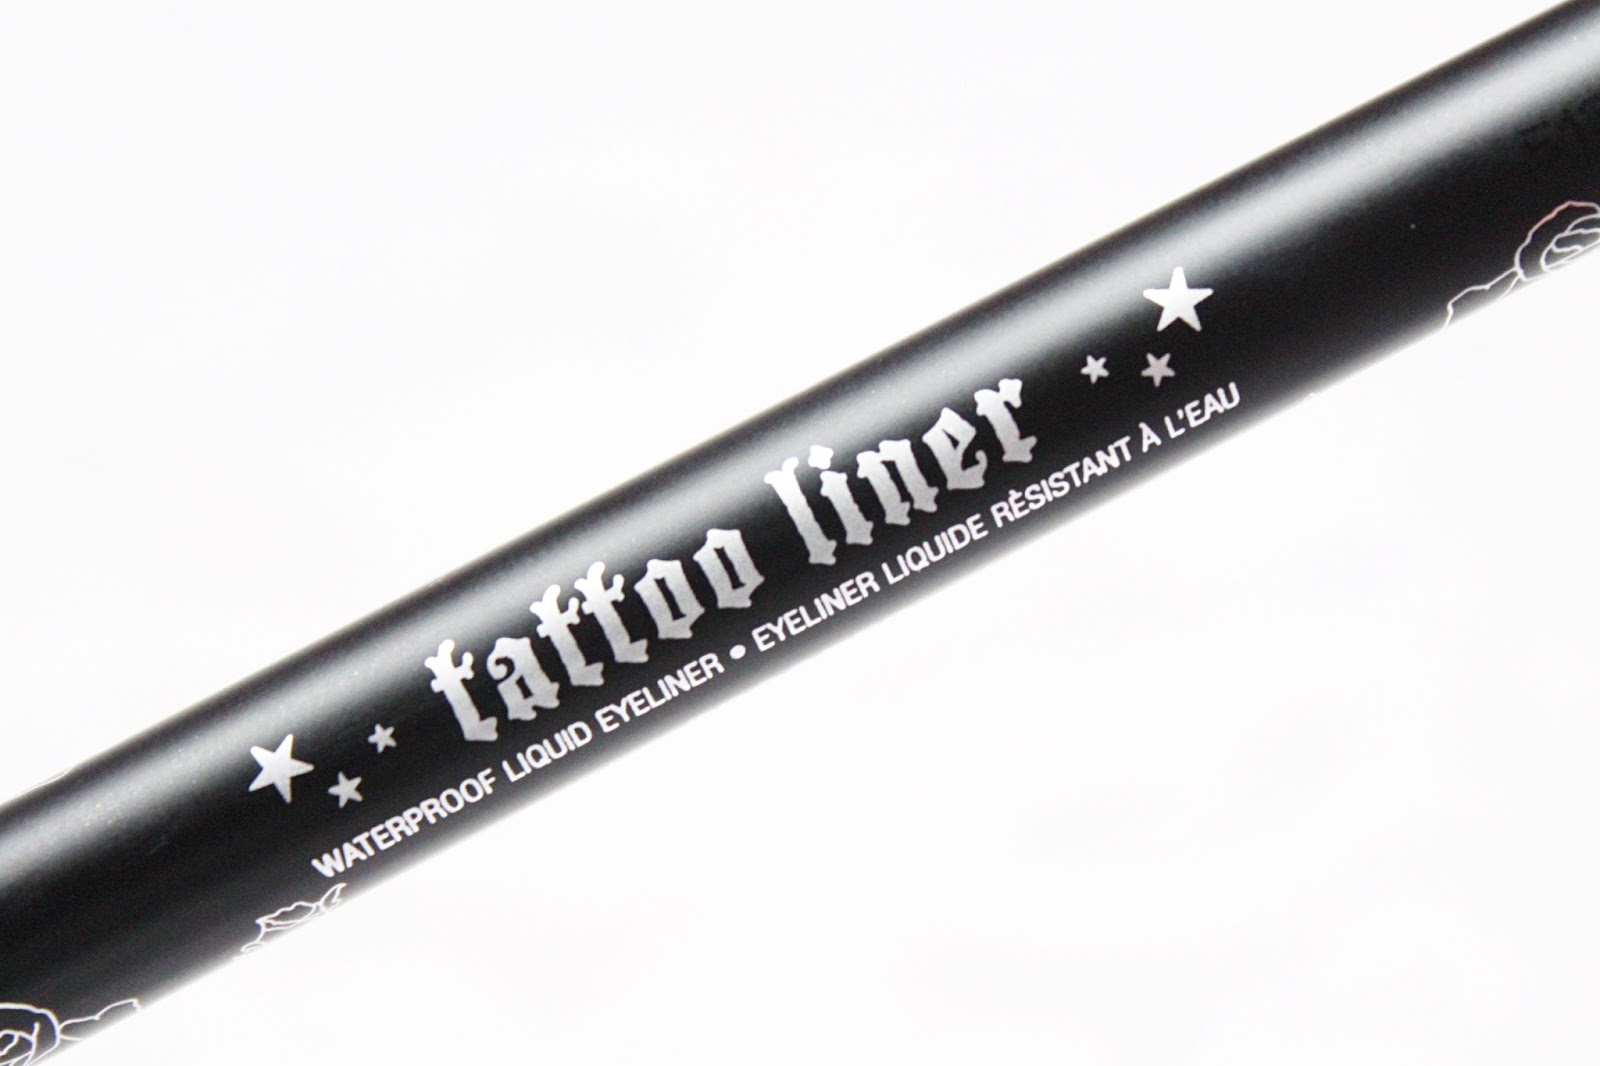 Kat Von D Tattoo Liner Review